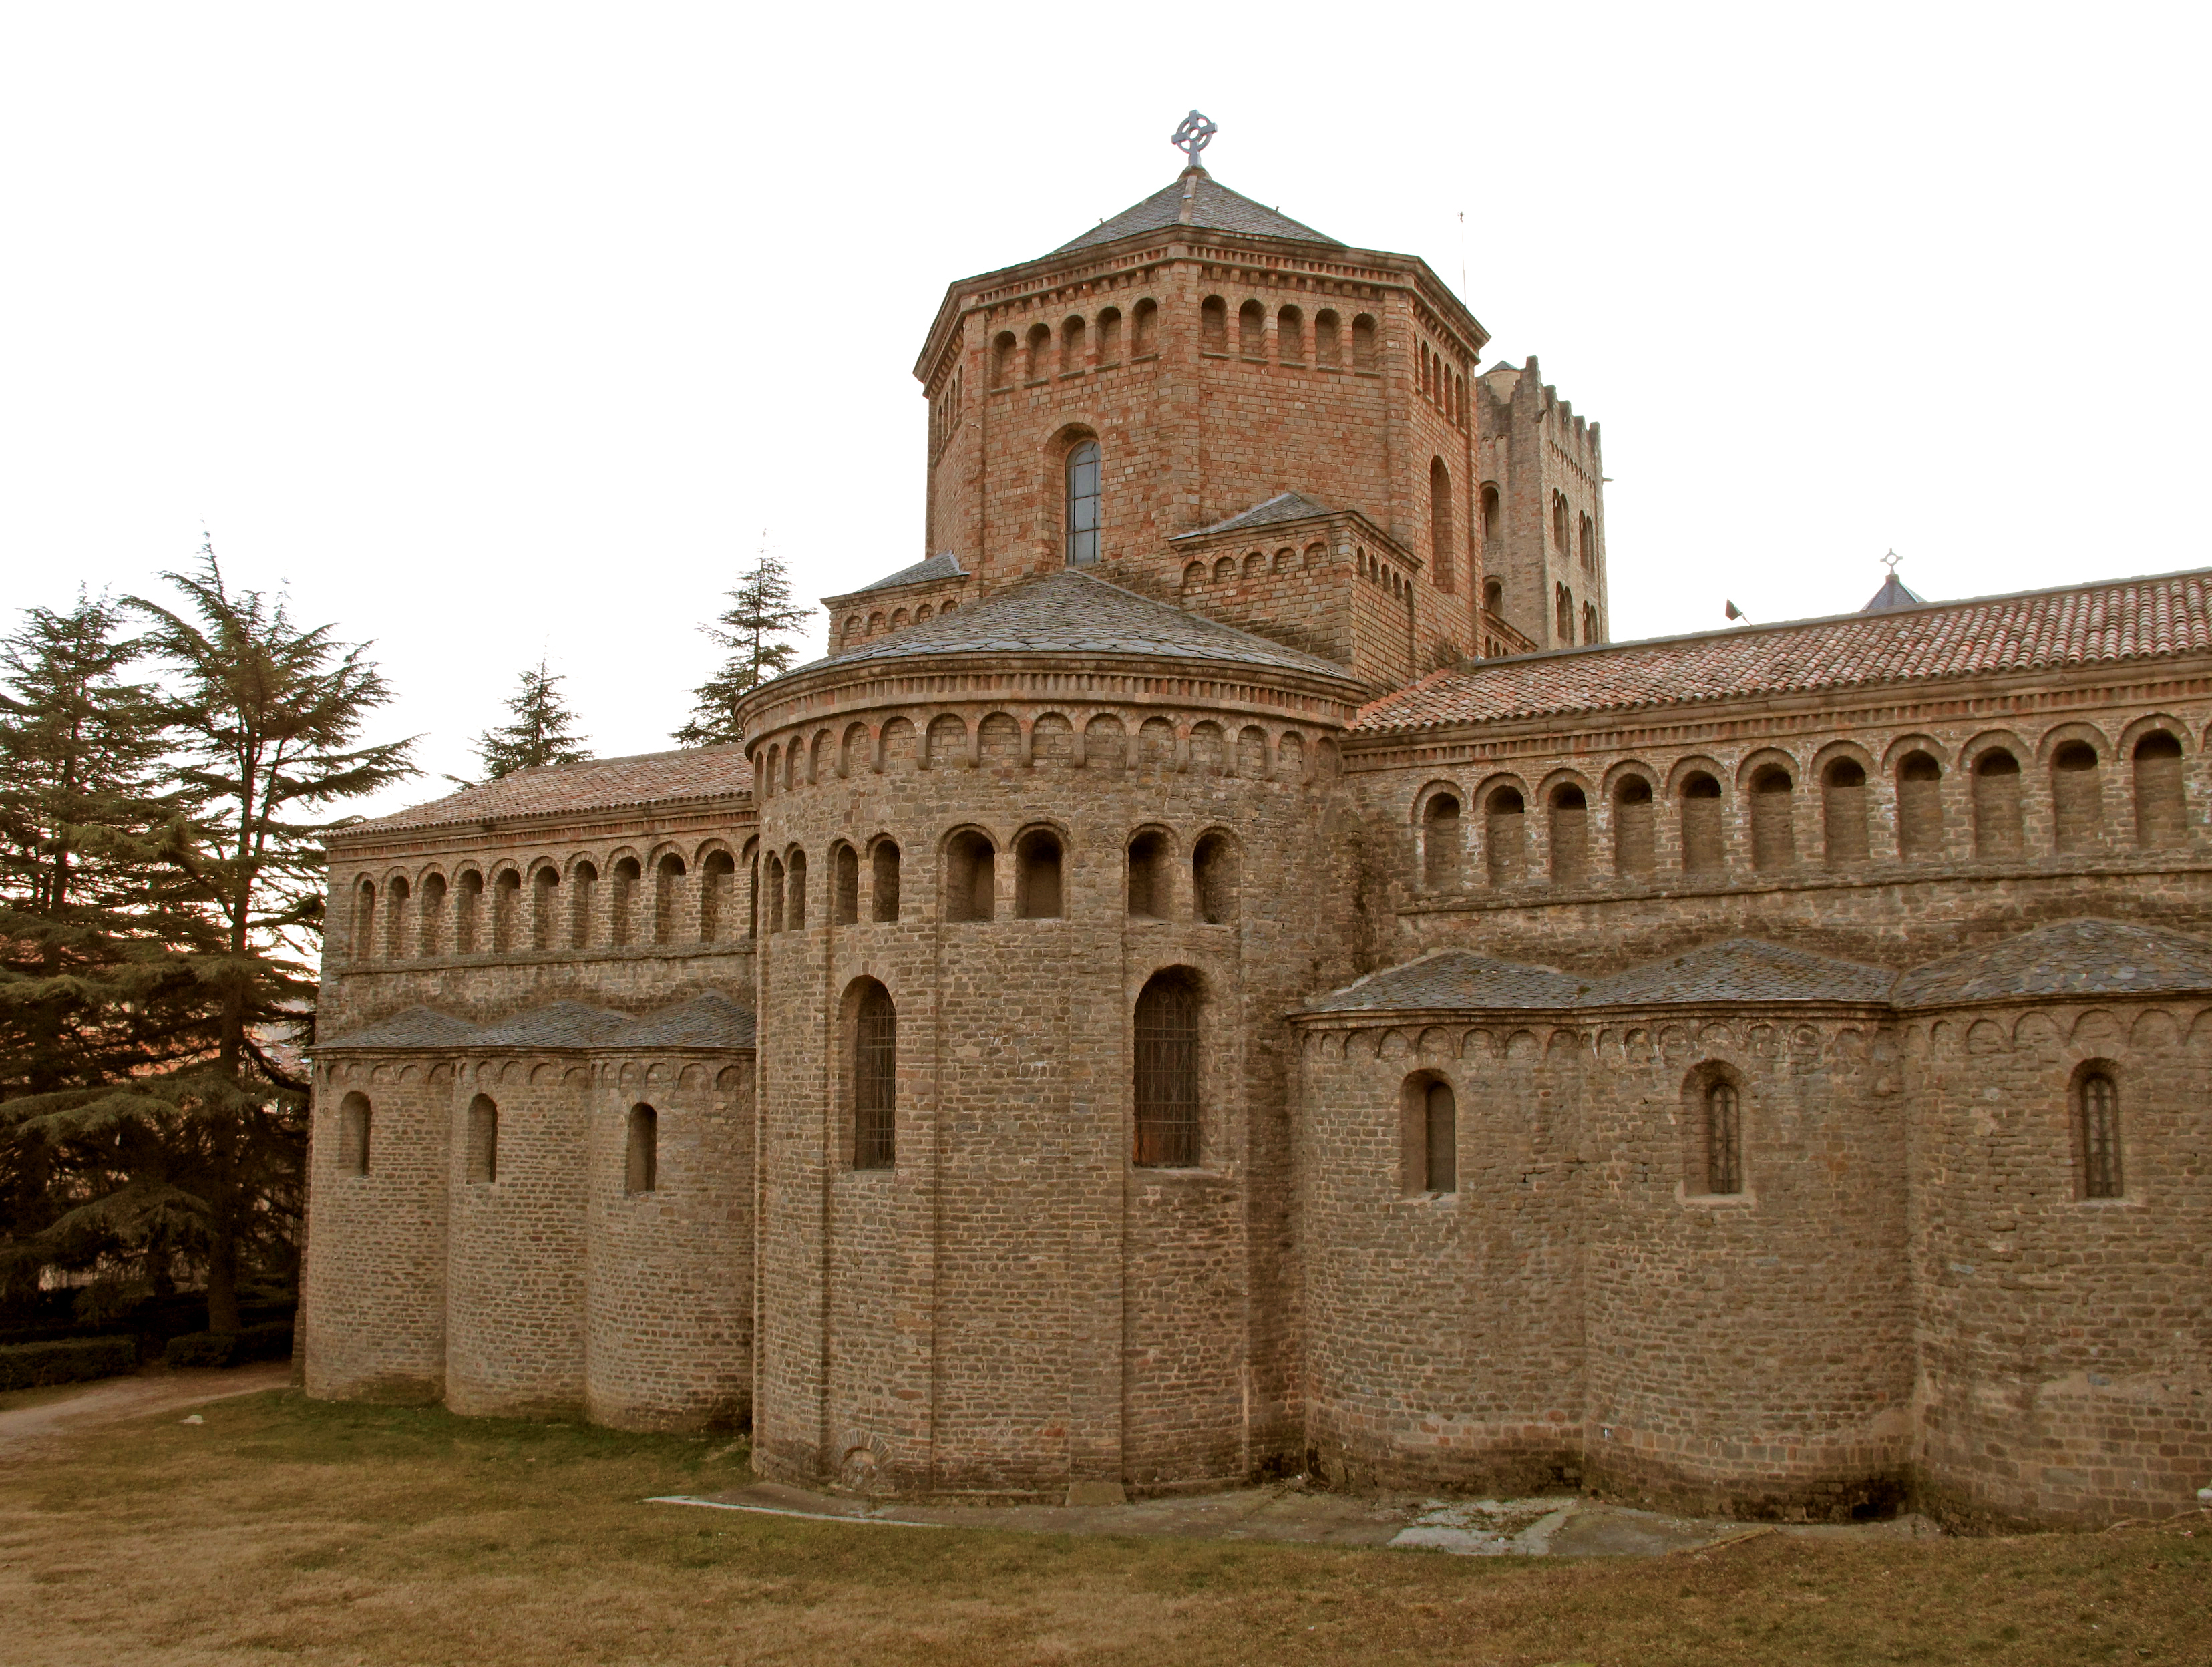 File:64 Monestir de Santa Maria de Ripoll.jpg - Wikimedia Commons